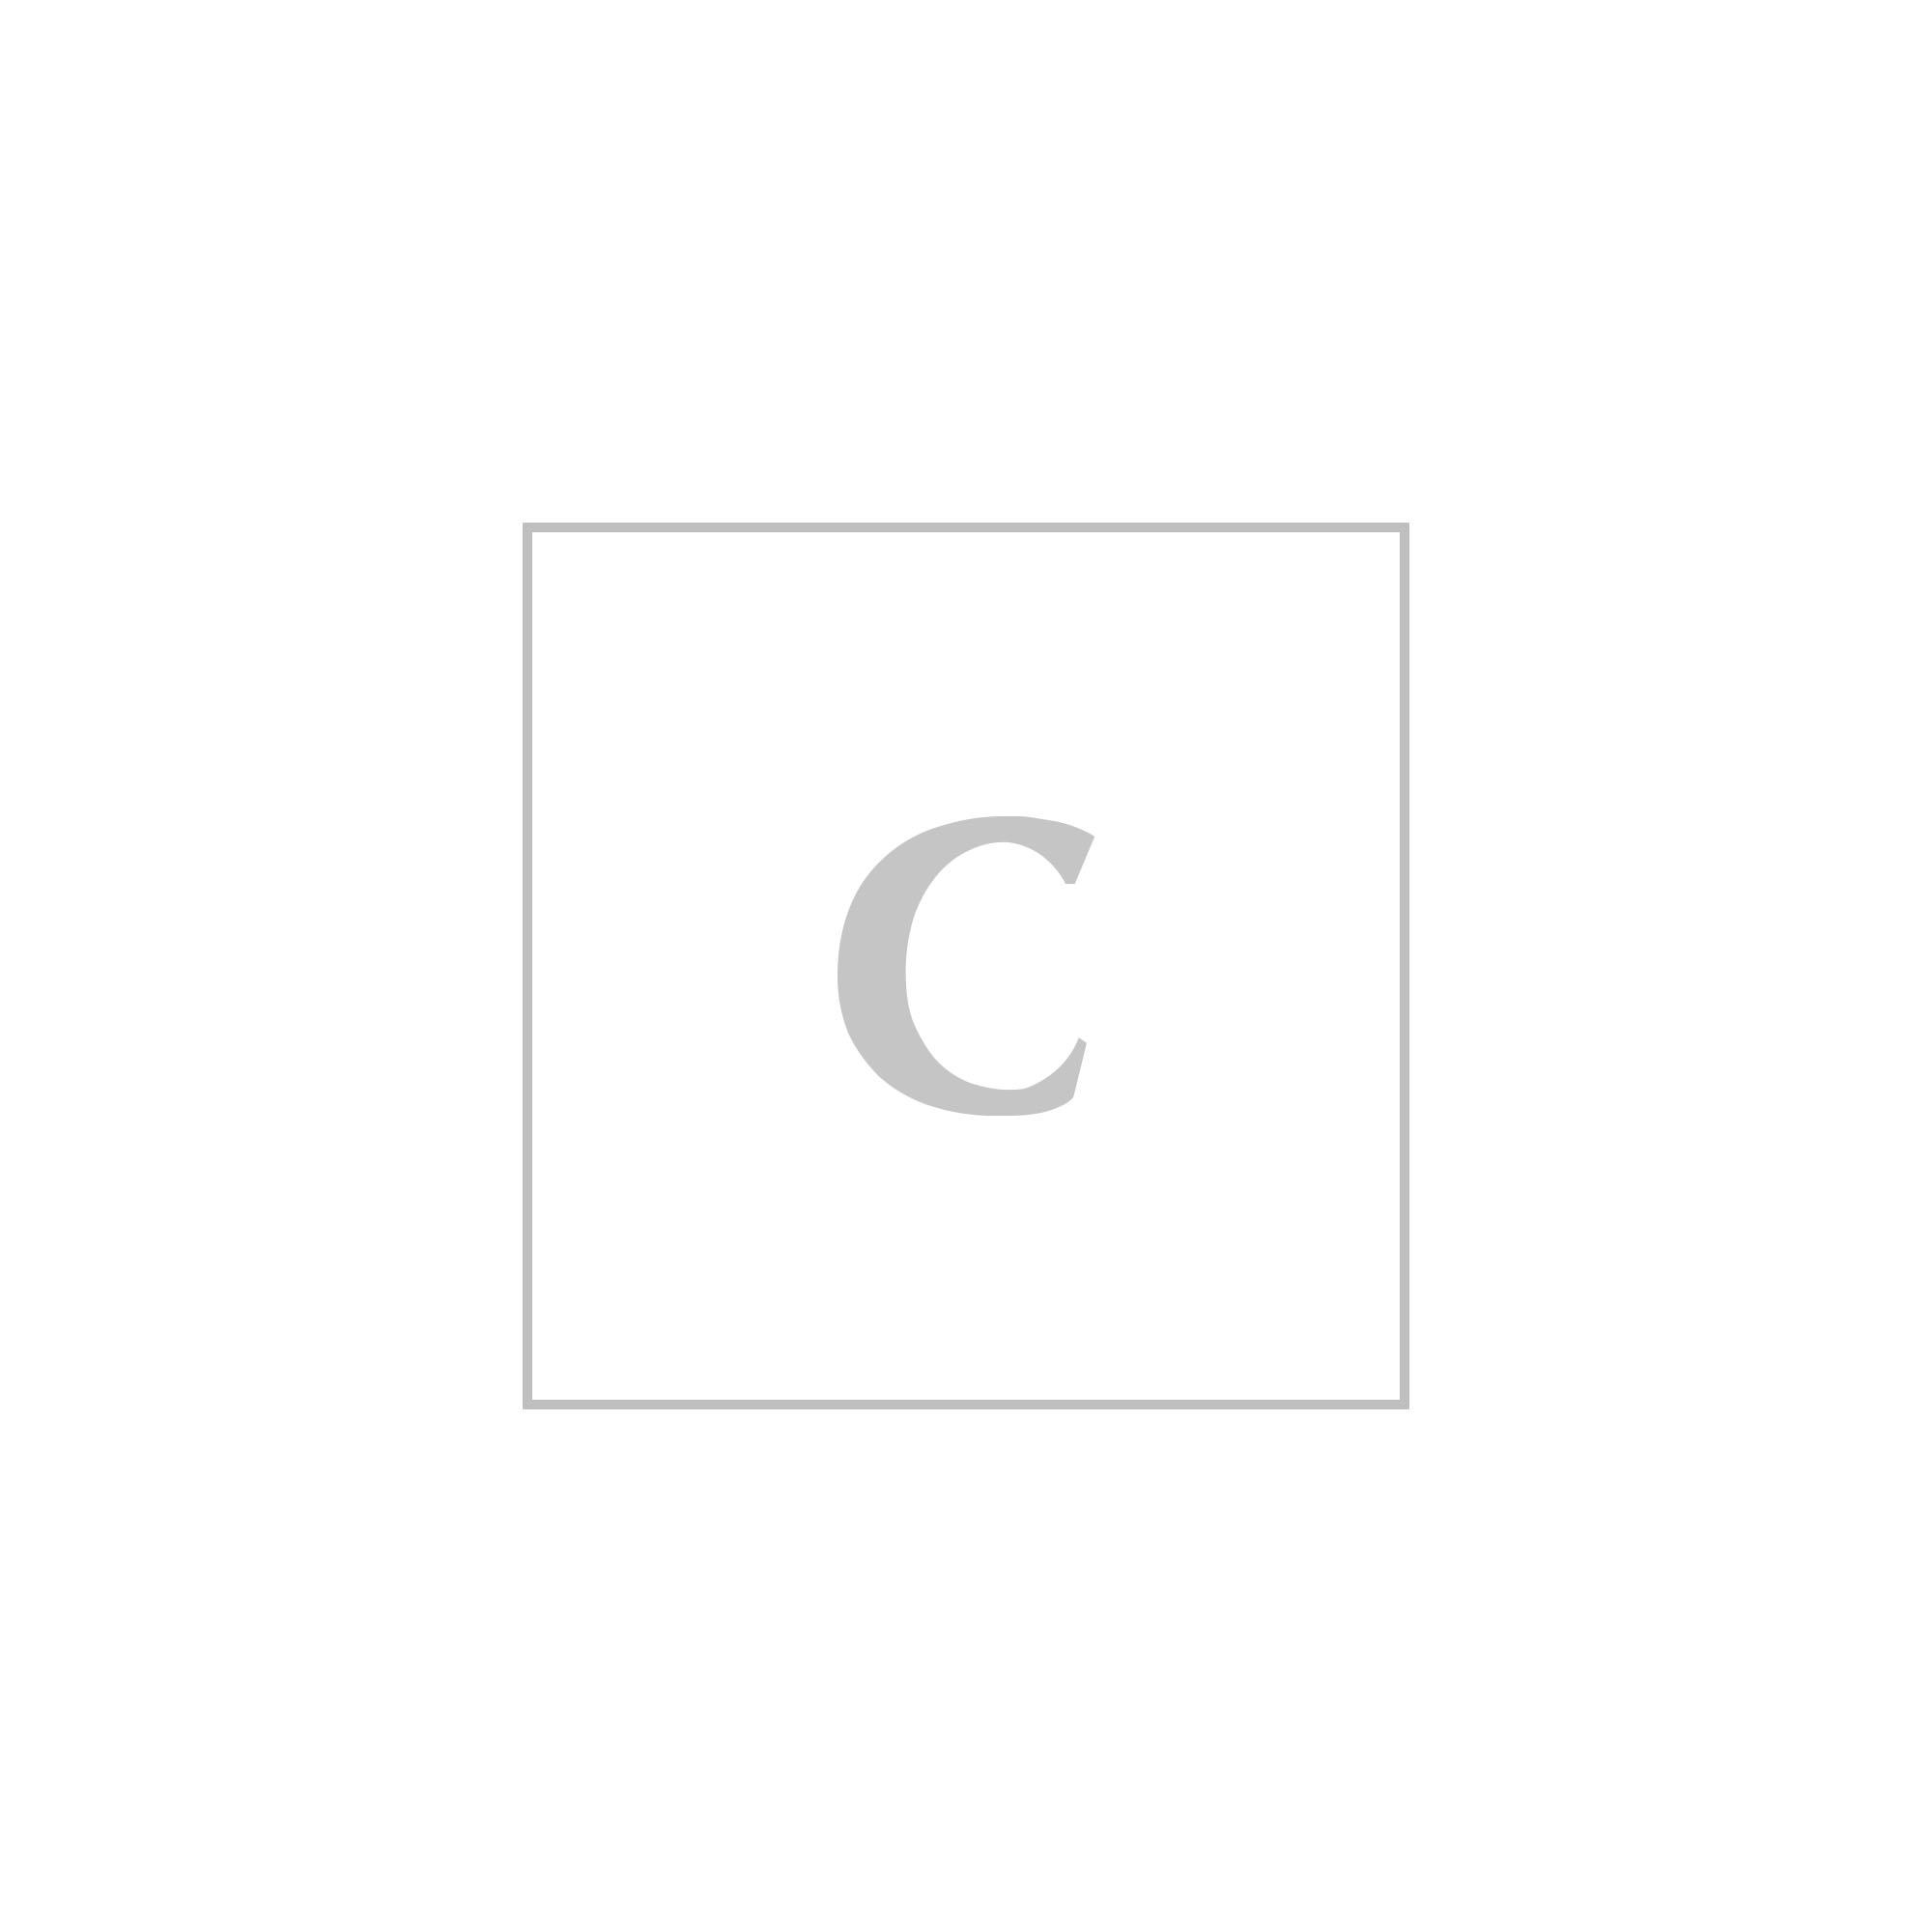 Michael kors borsa large cynthia logo satchel